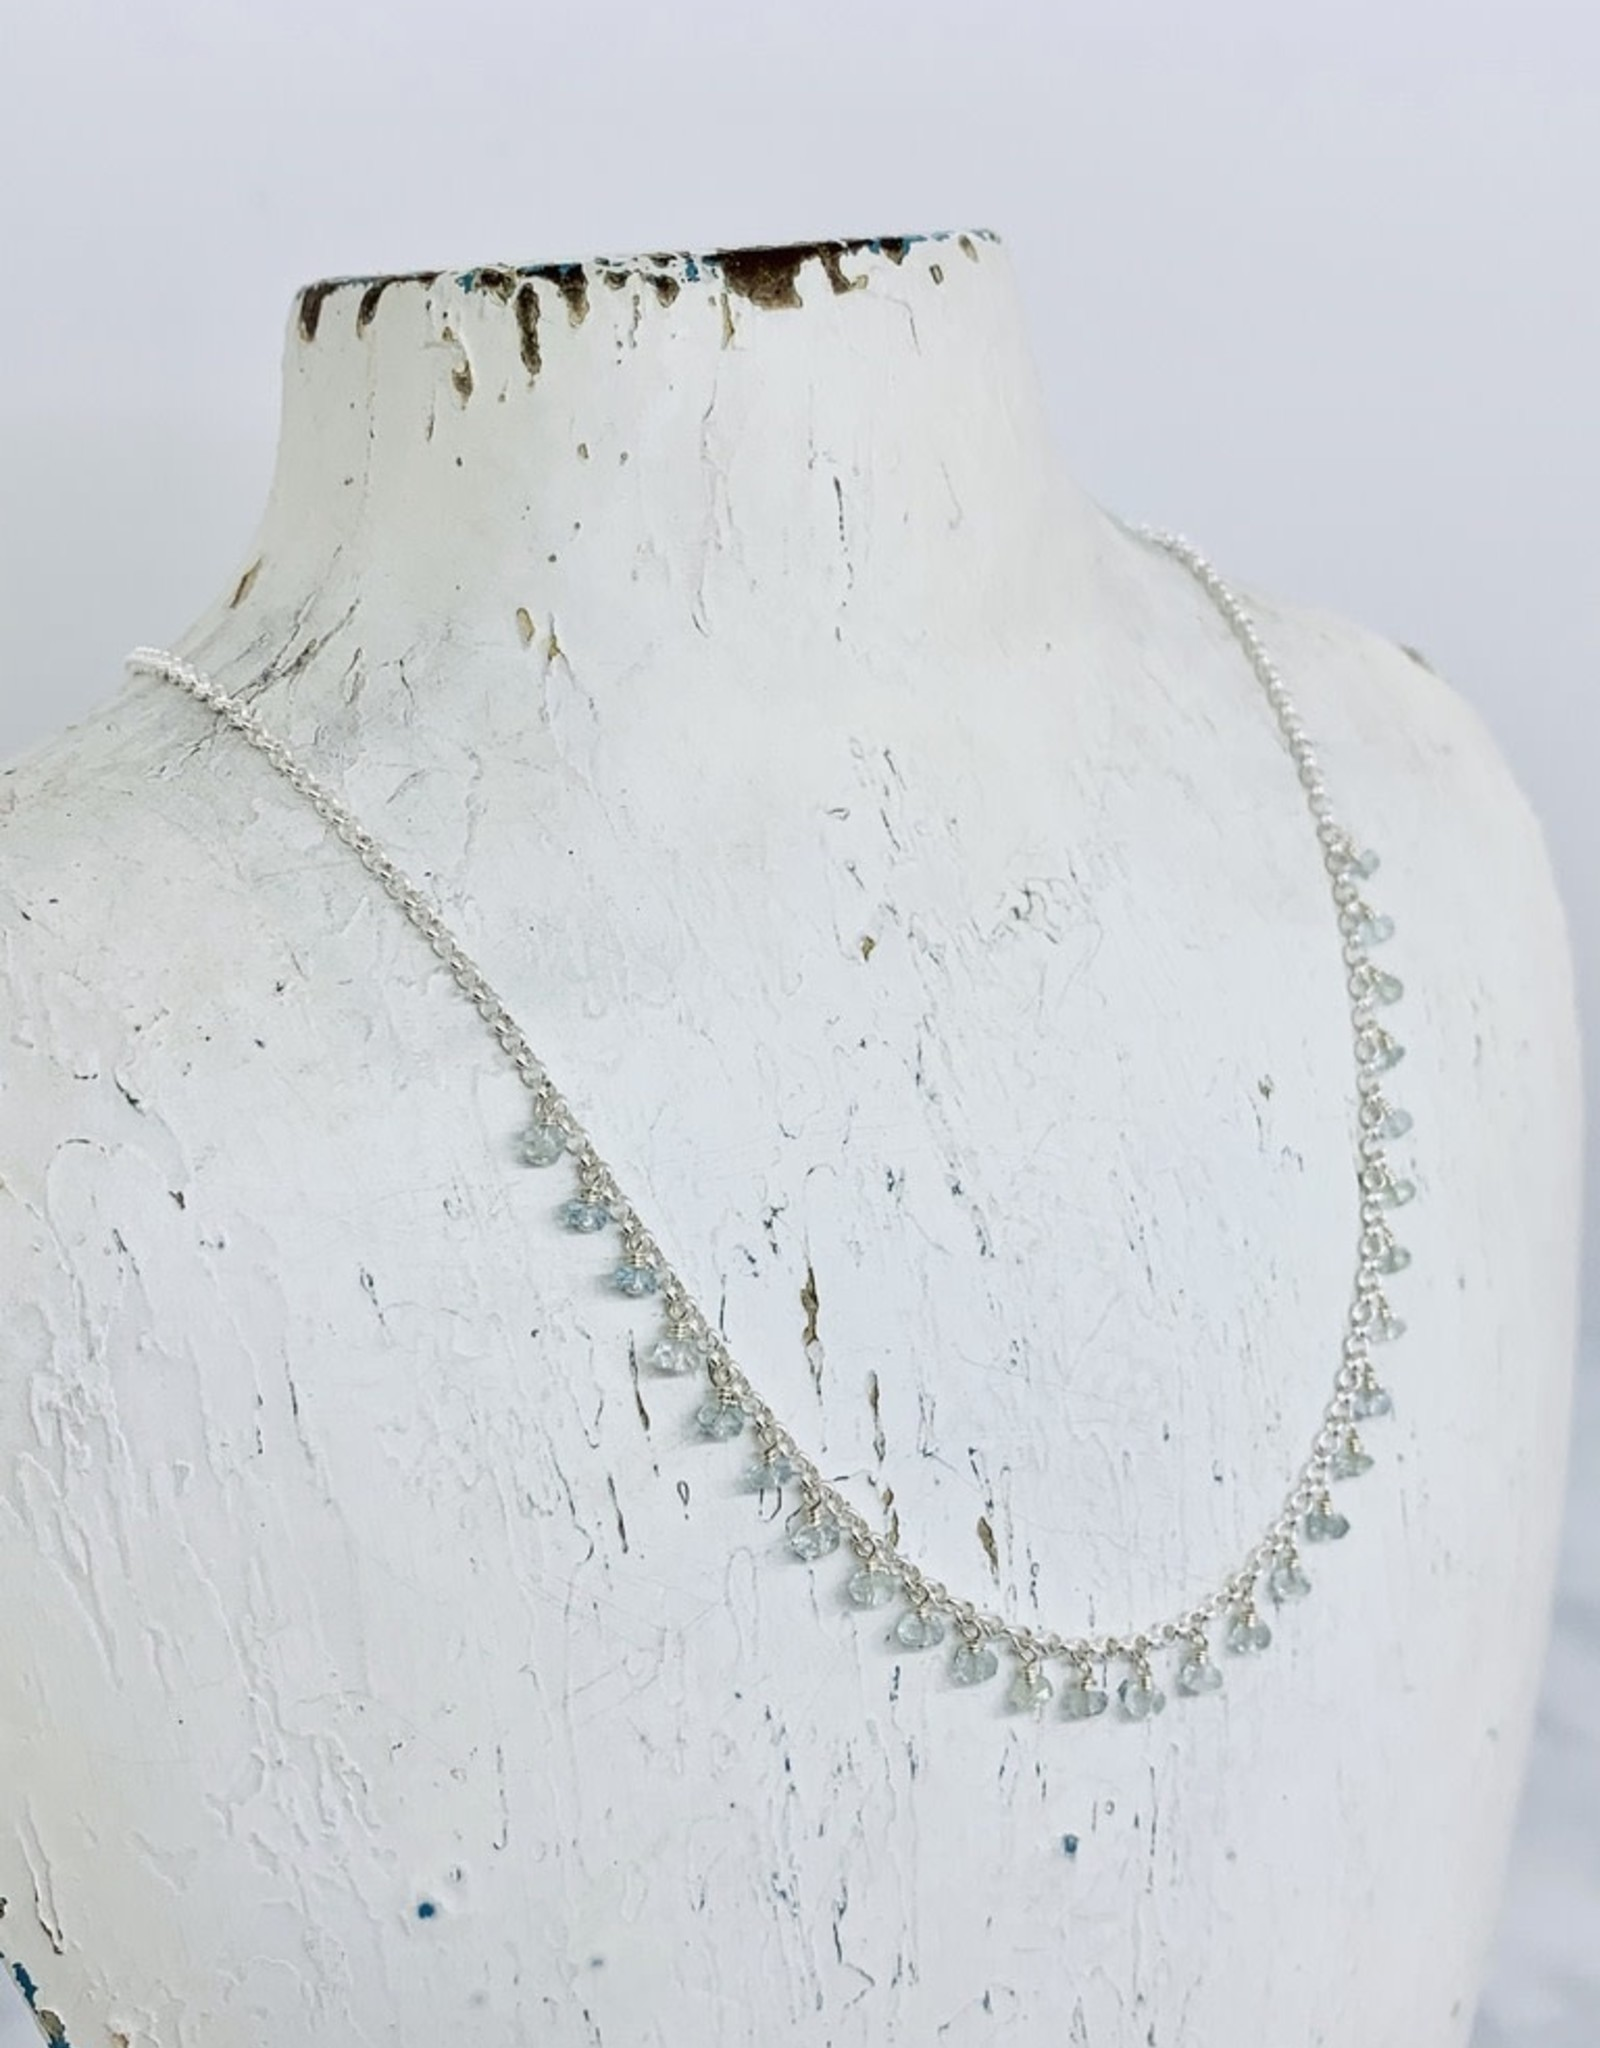 Handmade Necklace with tiny aquamarine dangle across